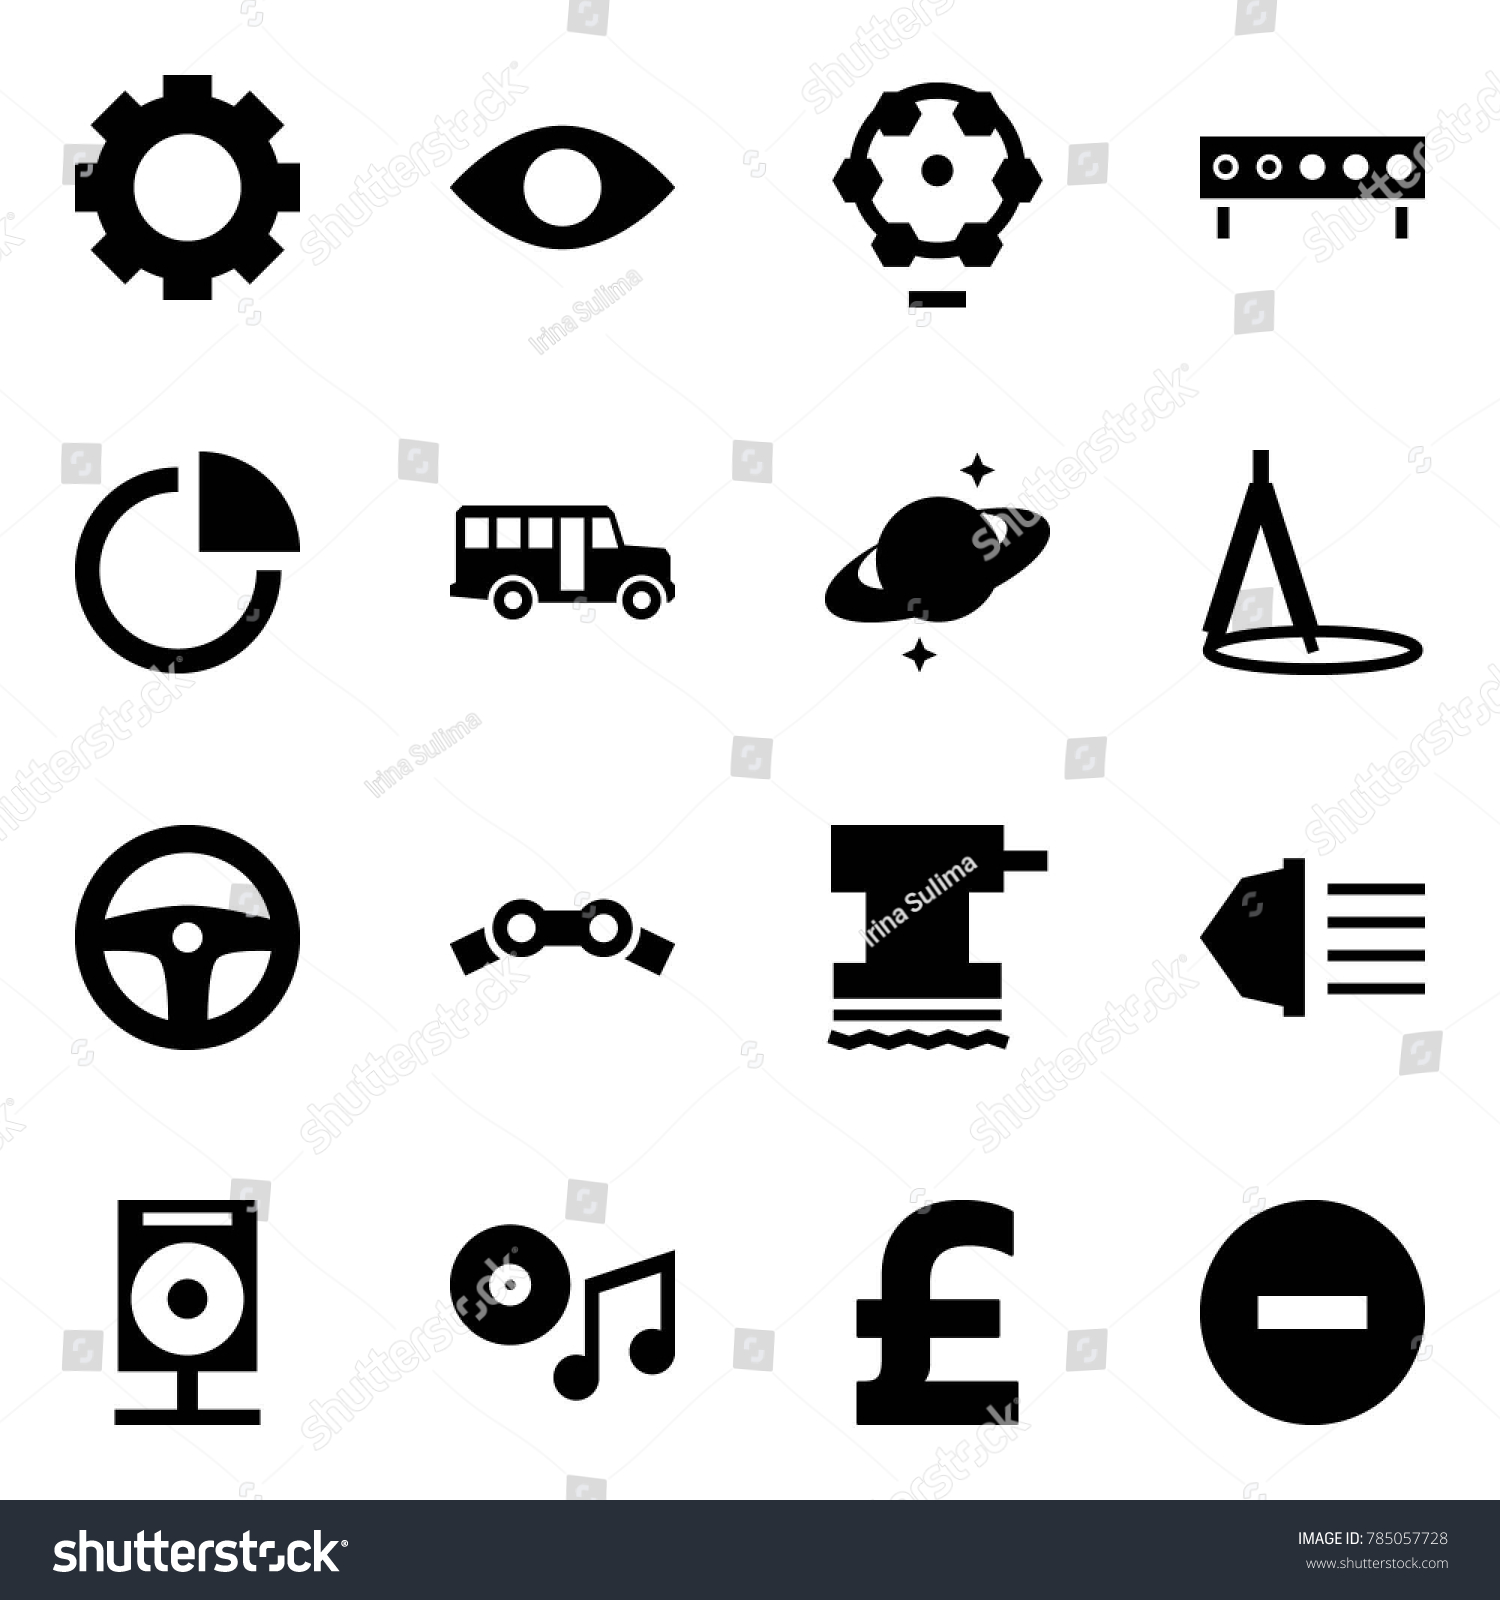 Origami Style Icon Set Gear Vector Stock Royalty Free Saturn Wheel Diagram Eye Ferris Biathlon